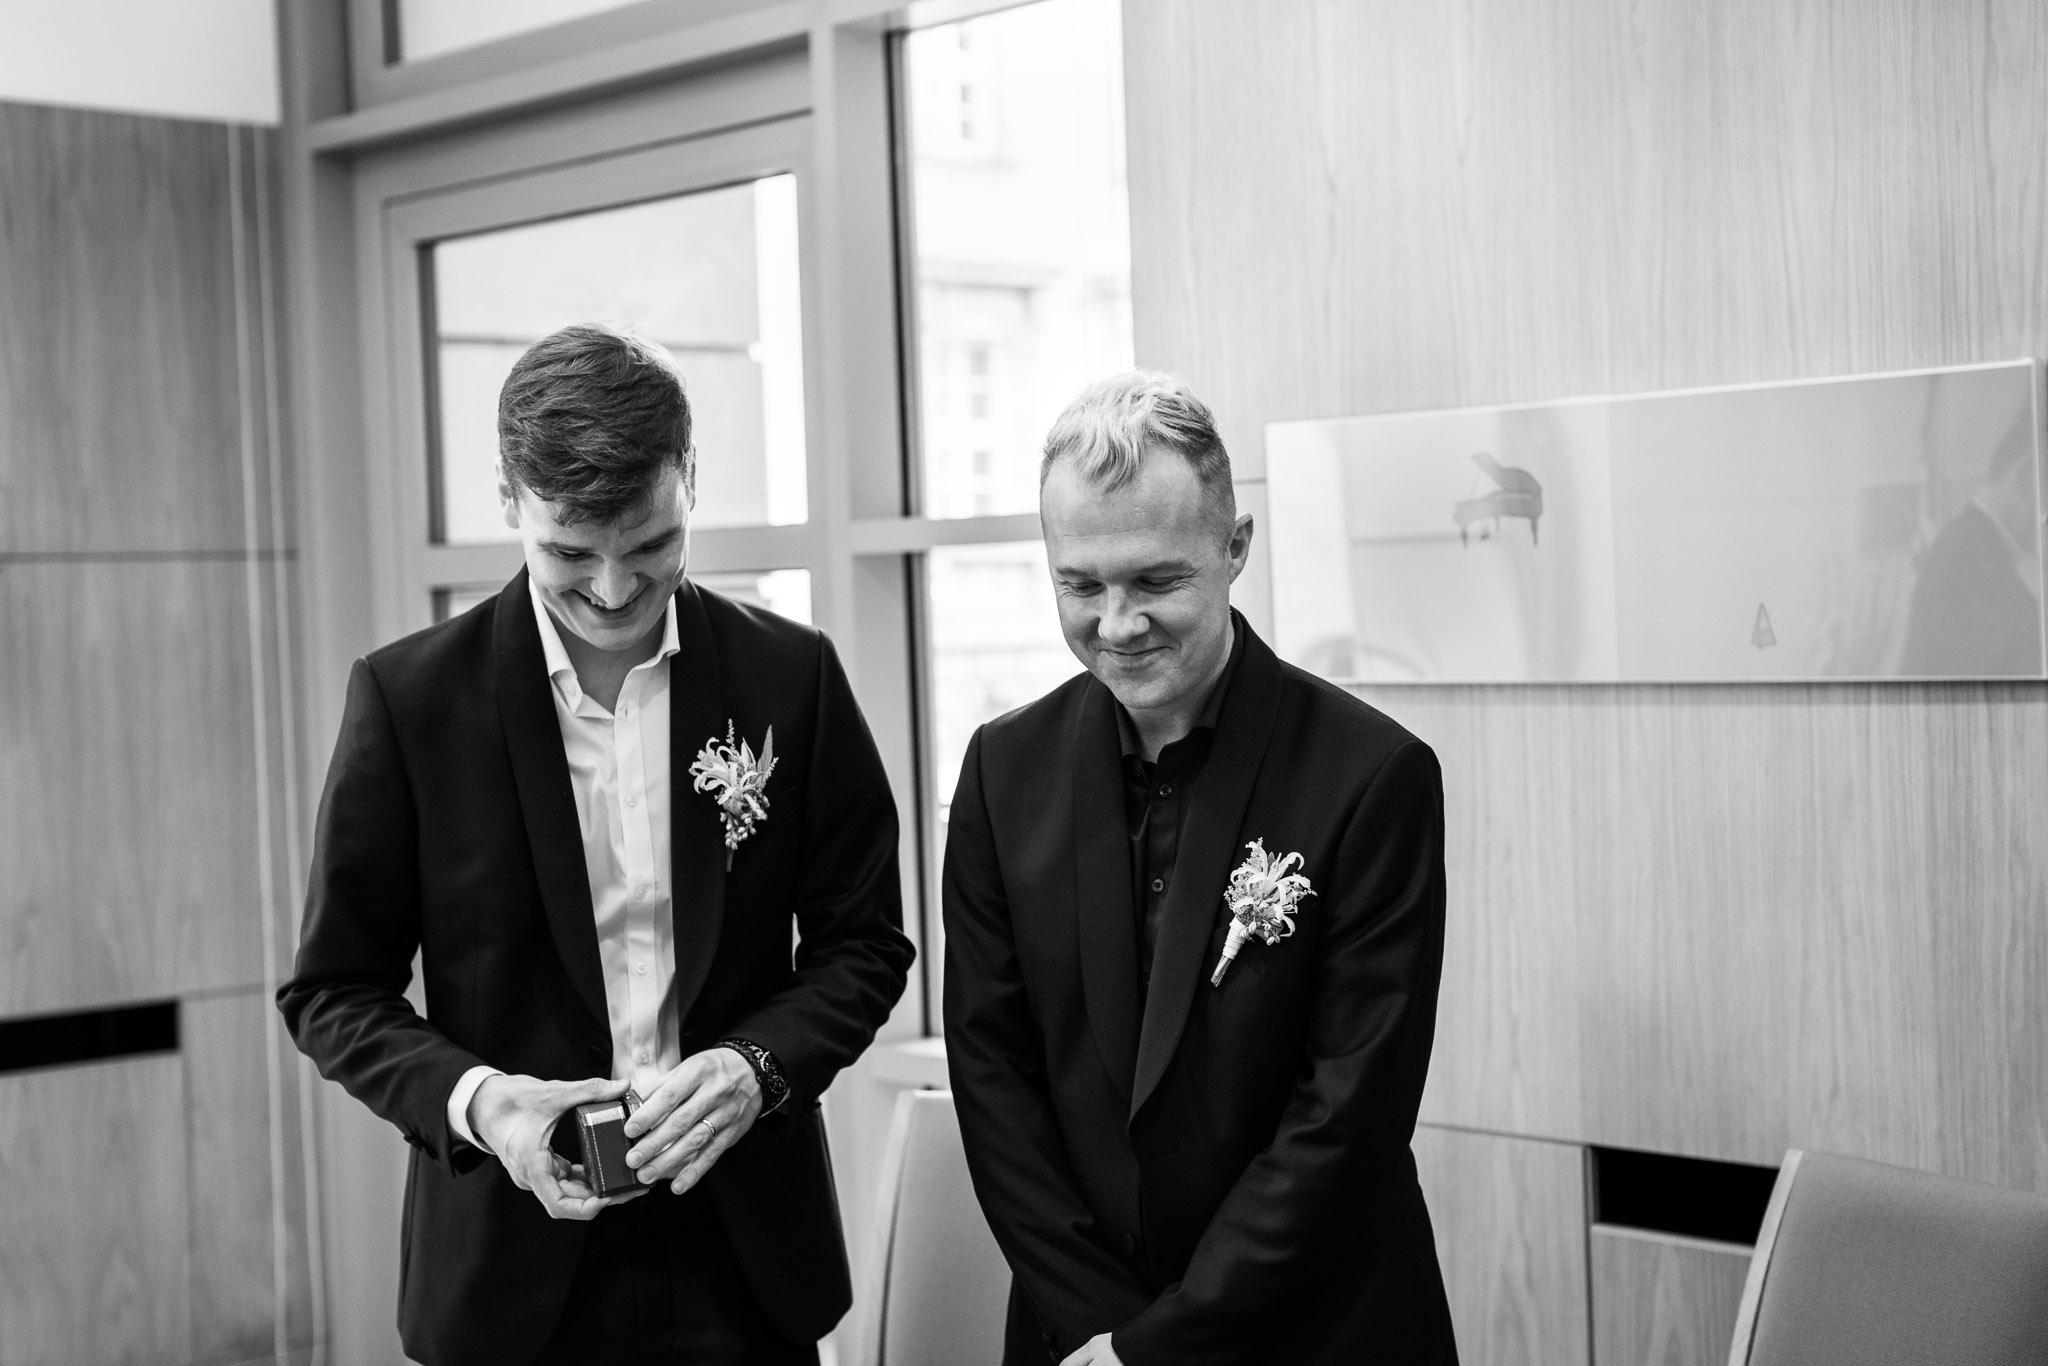 22_Hochzeit_Bräutigam.jpg